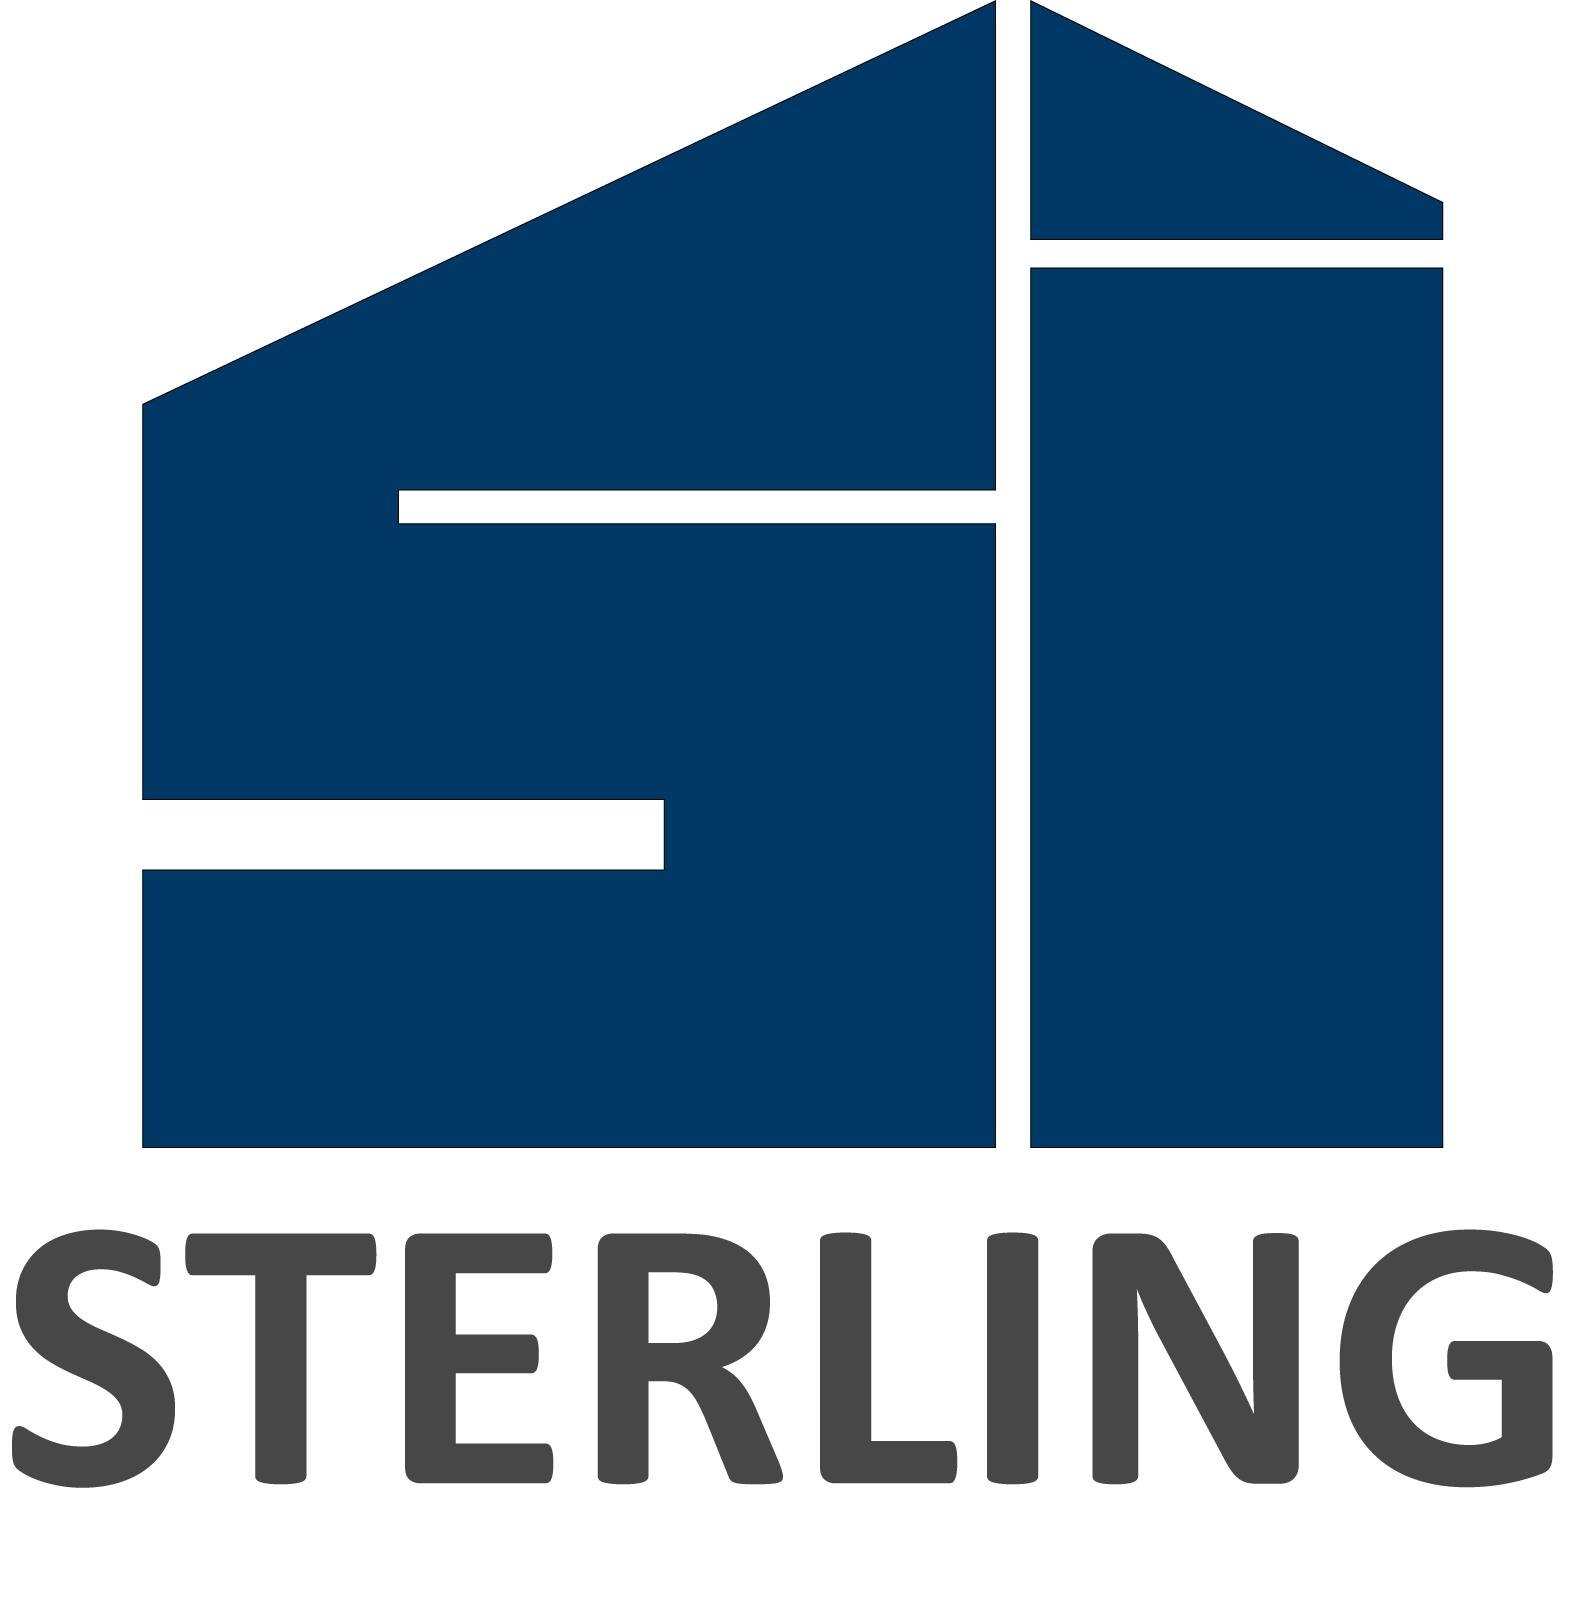 Sterling Insurance Company logo